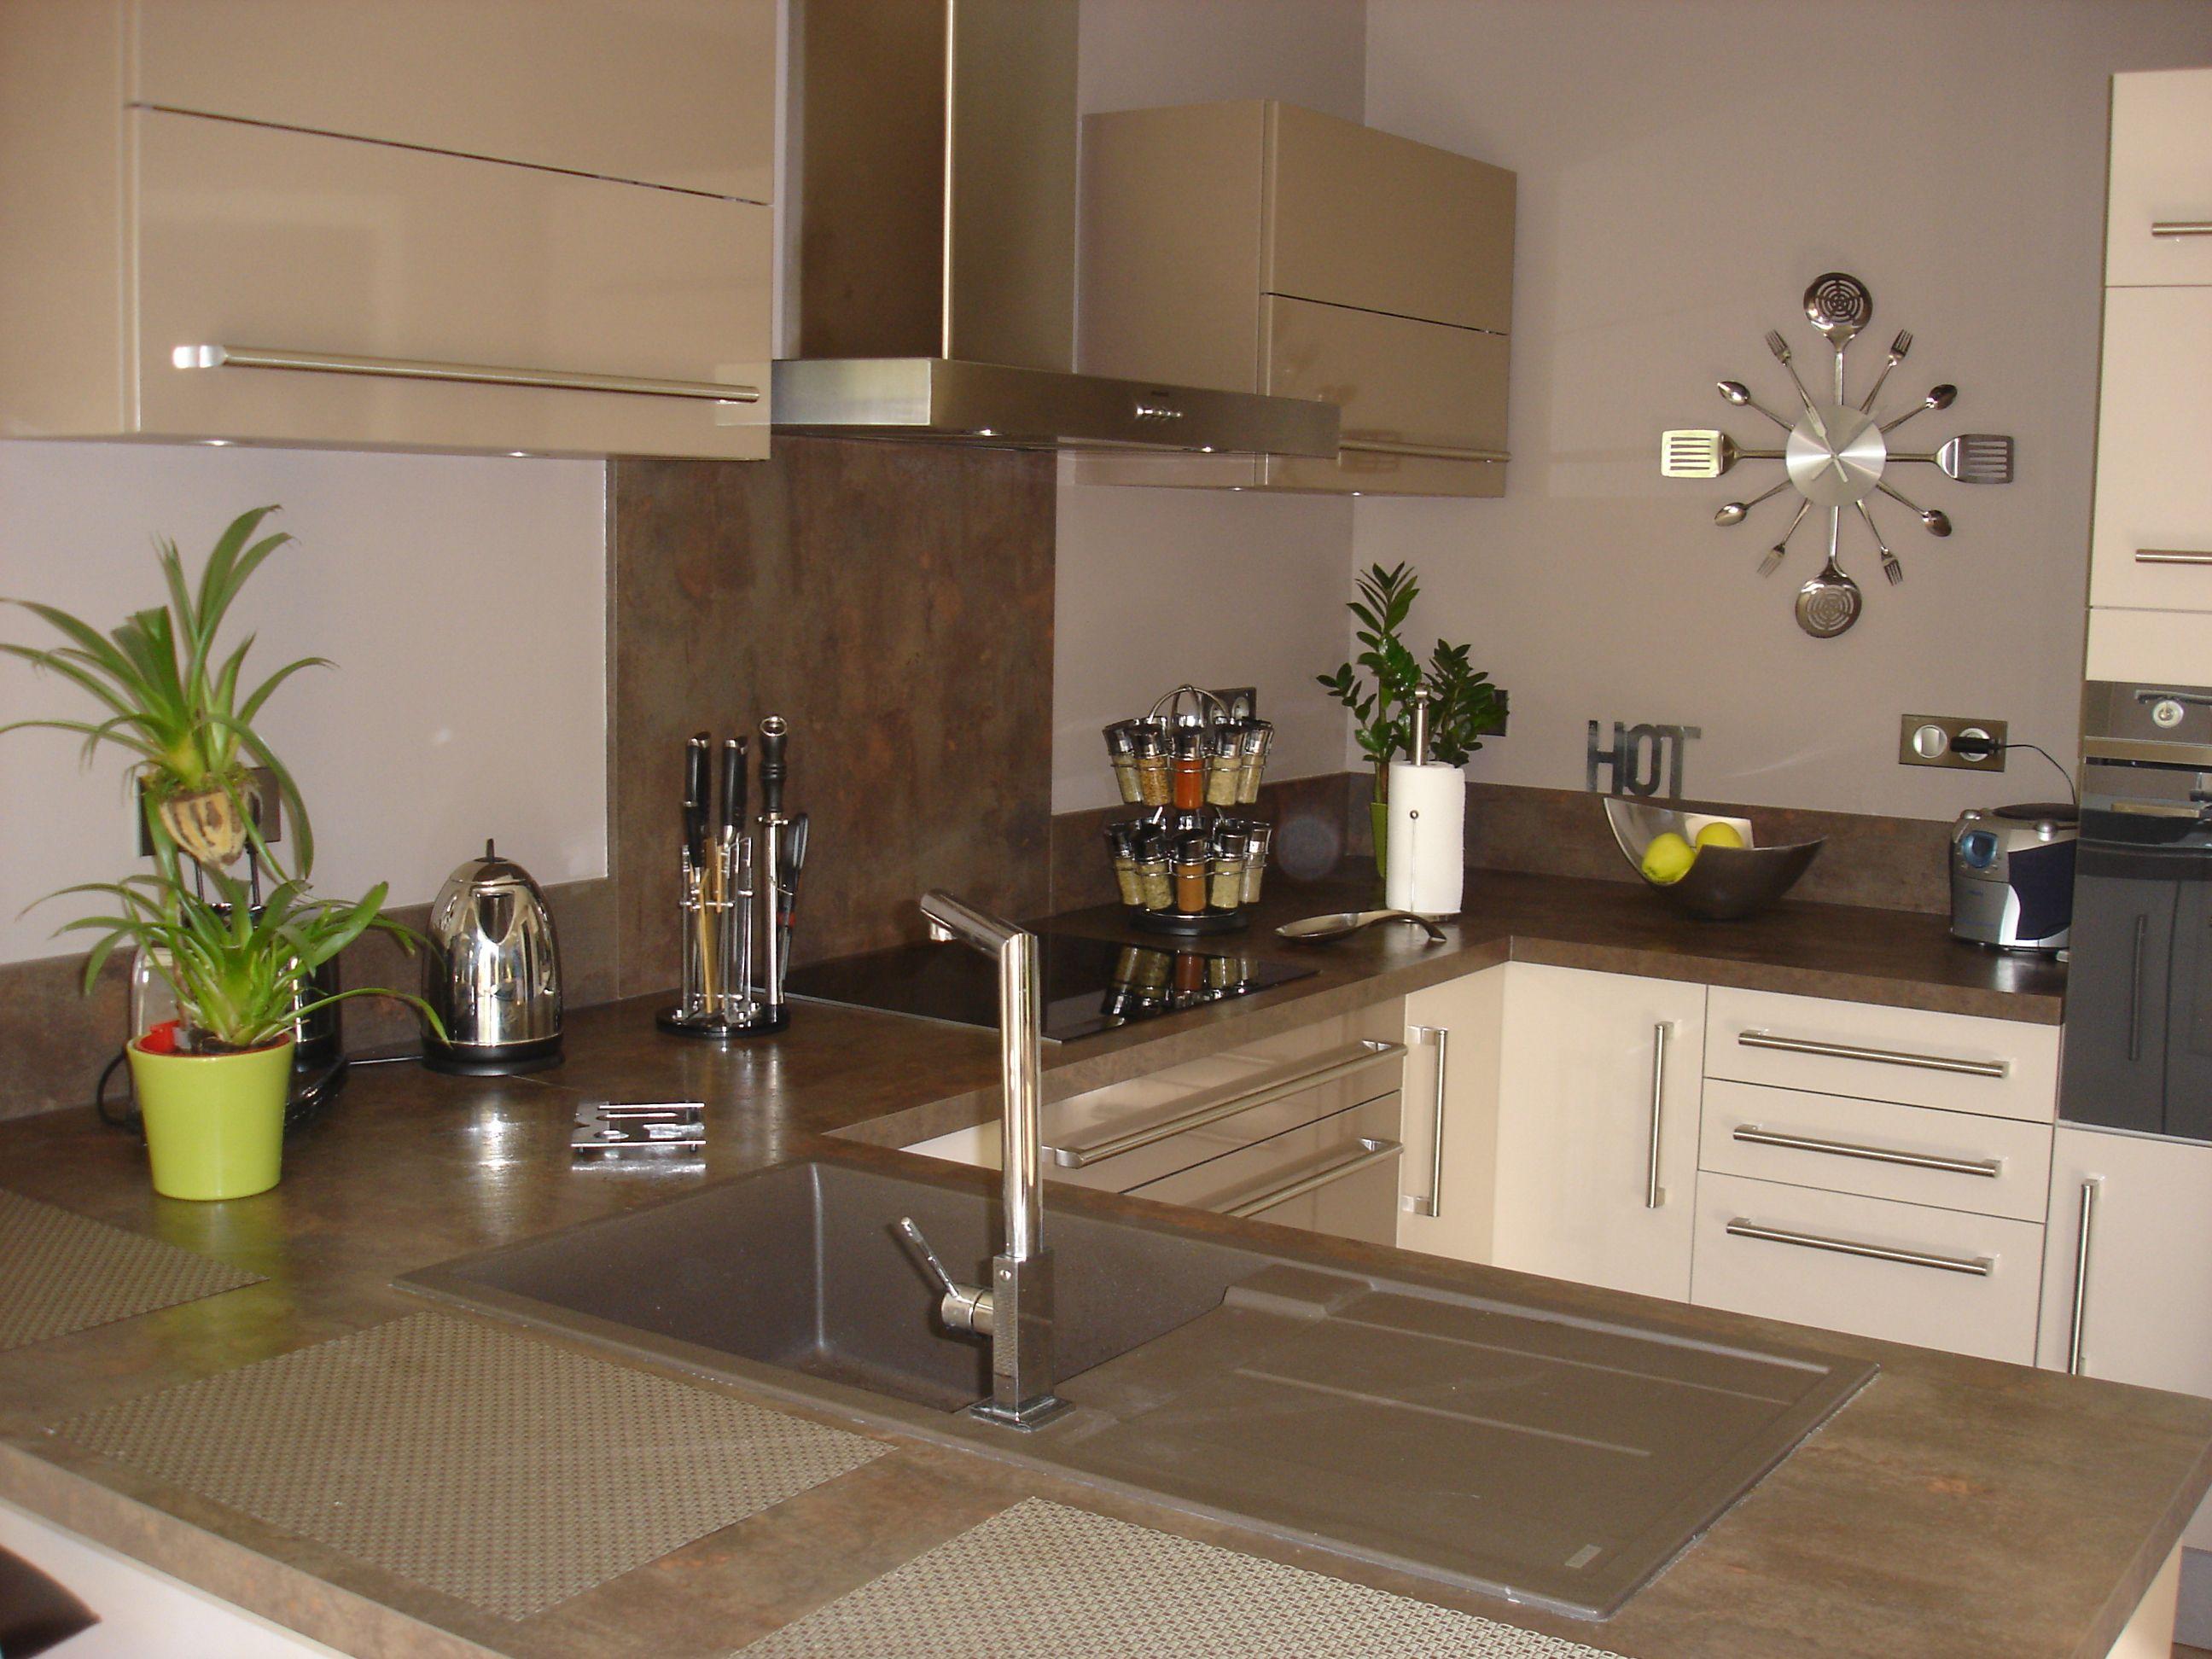 cuisine blanc cass recherche google cuisine pinterest kitchen kitchen cabinets et home. Black Bedroom Furniture Sets. Home Design Ideas